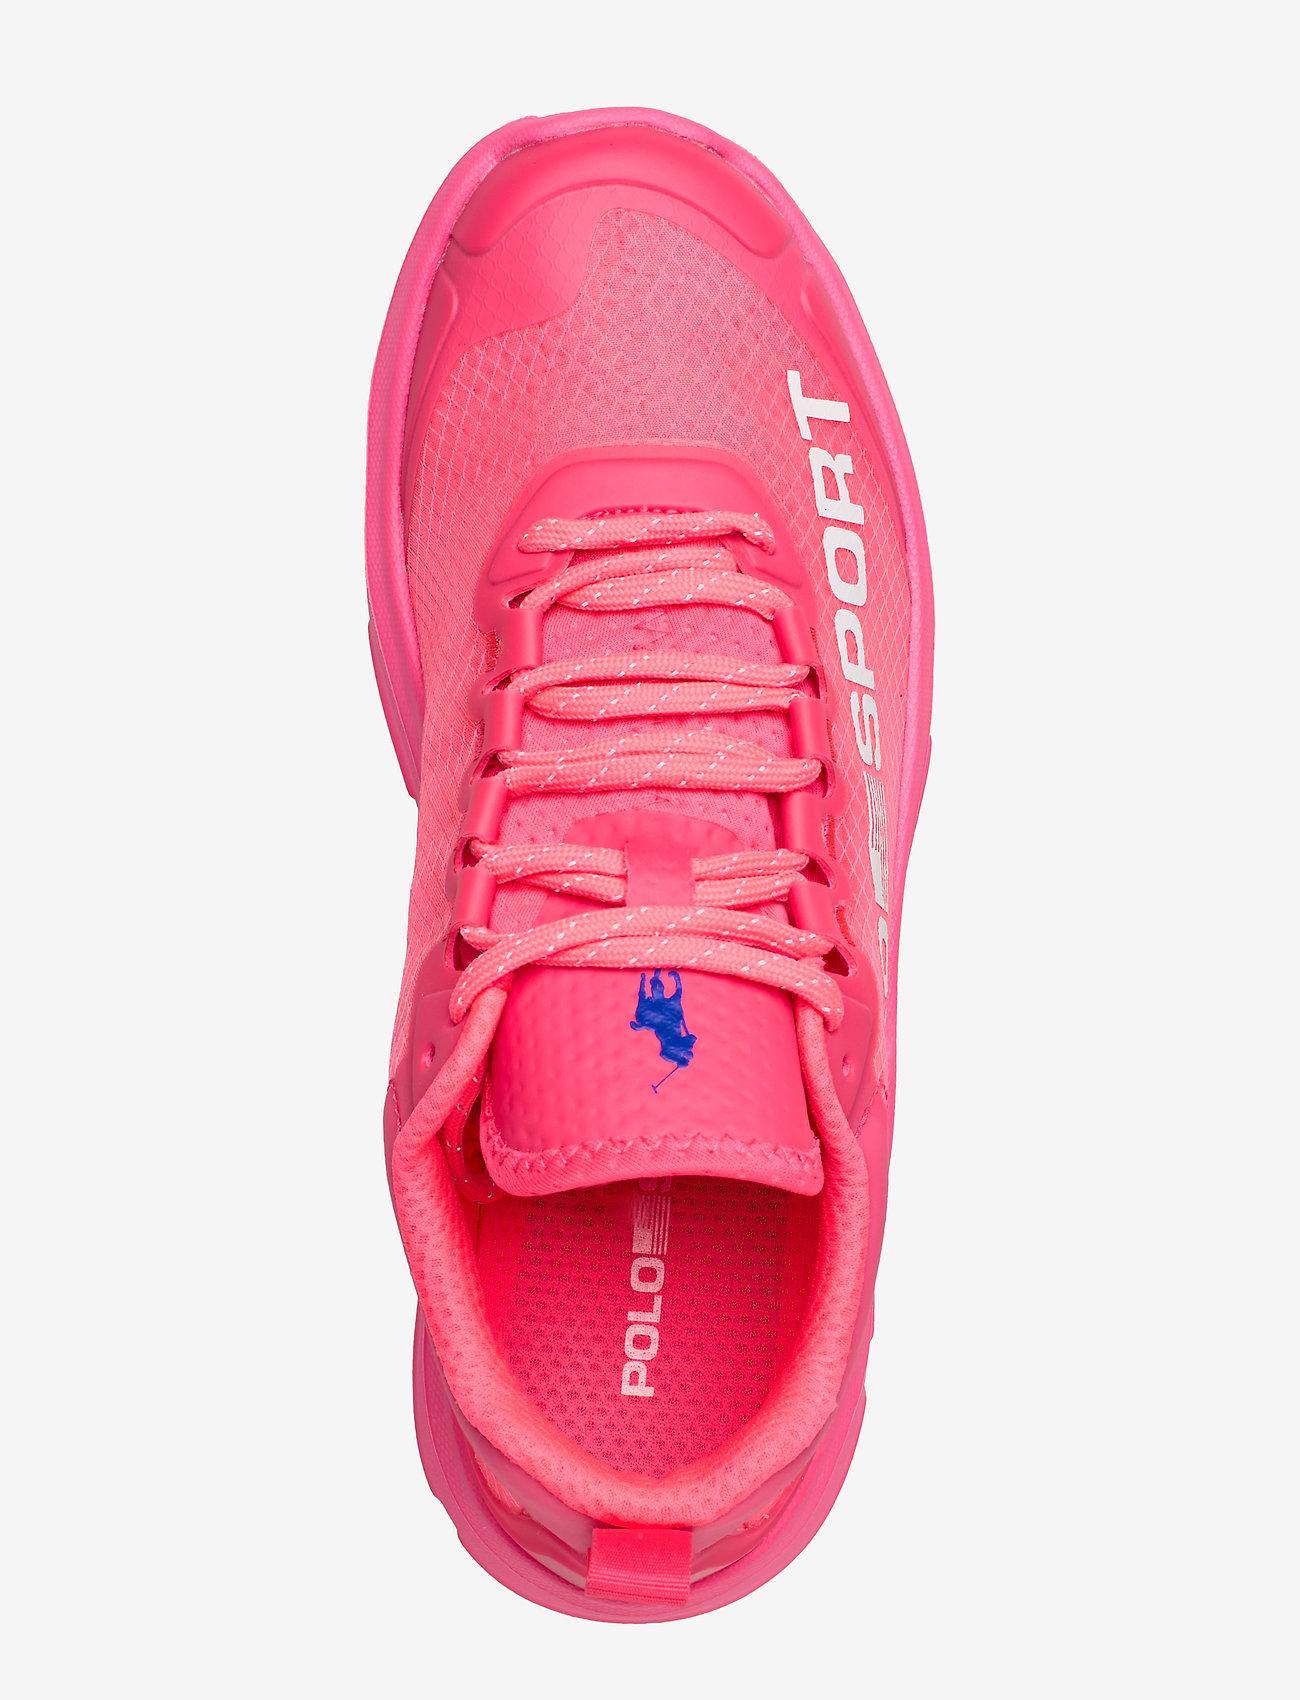 Polo Sport Tech Sneaker (Neon Fuschia) - Polo Ralph Lauren